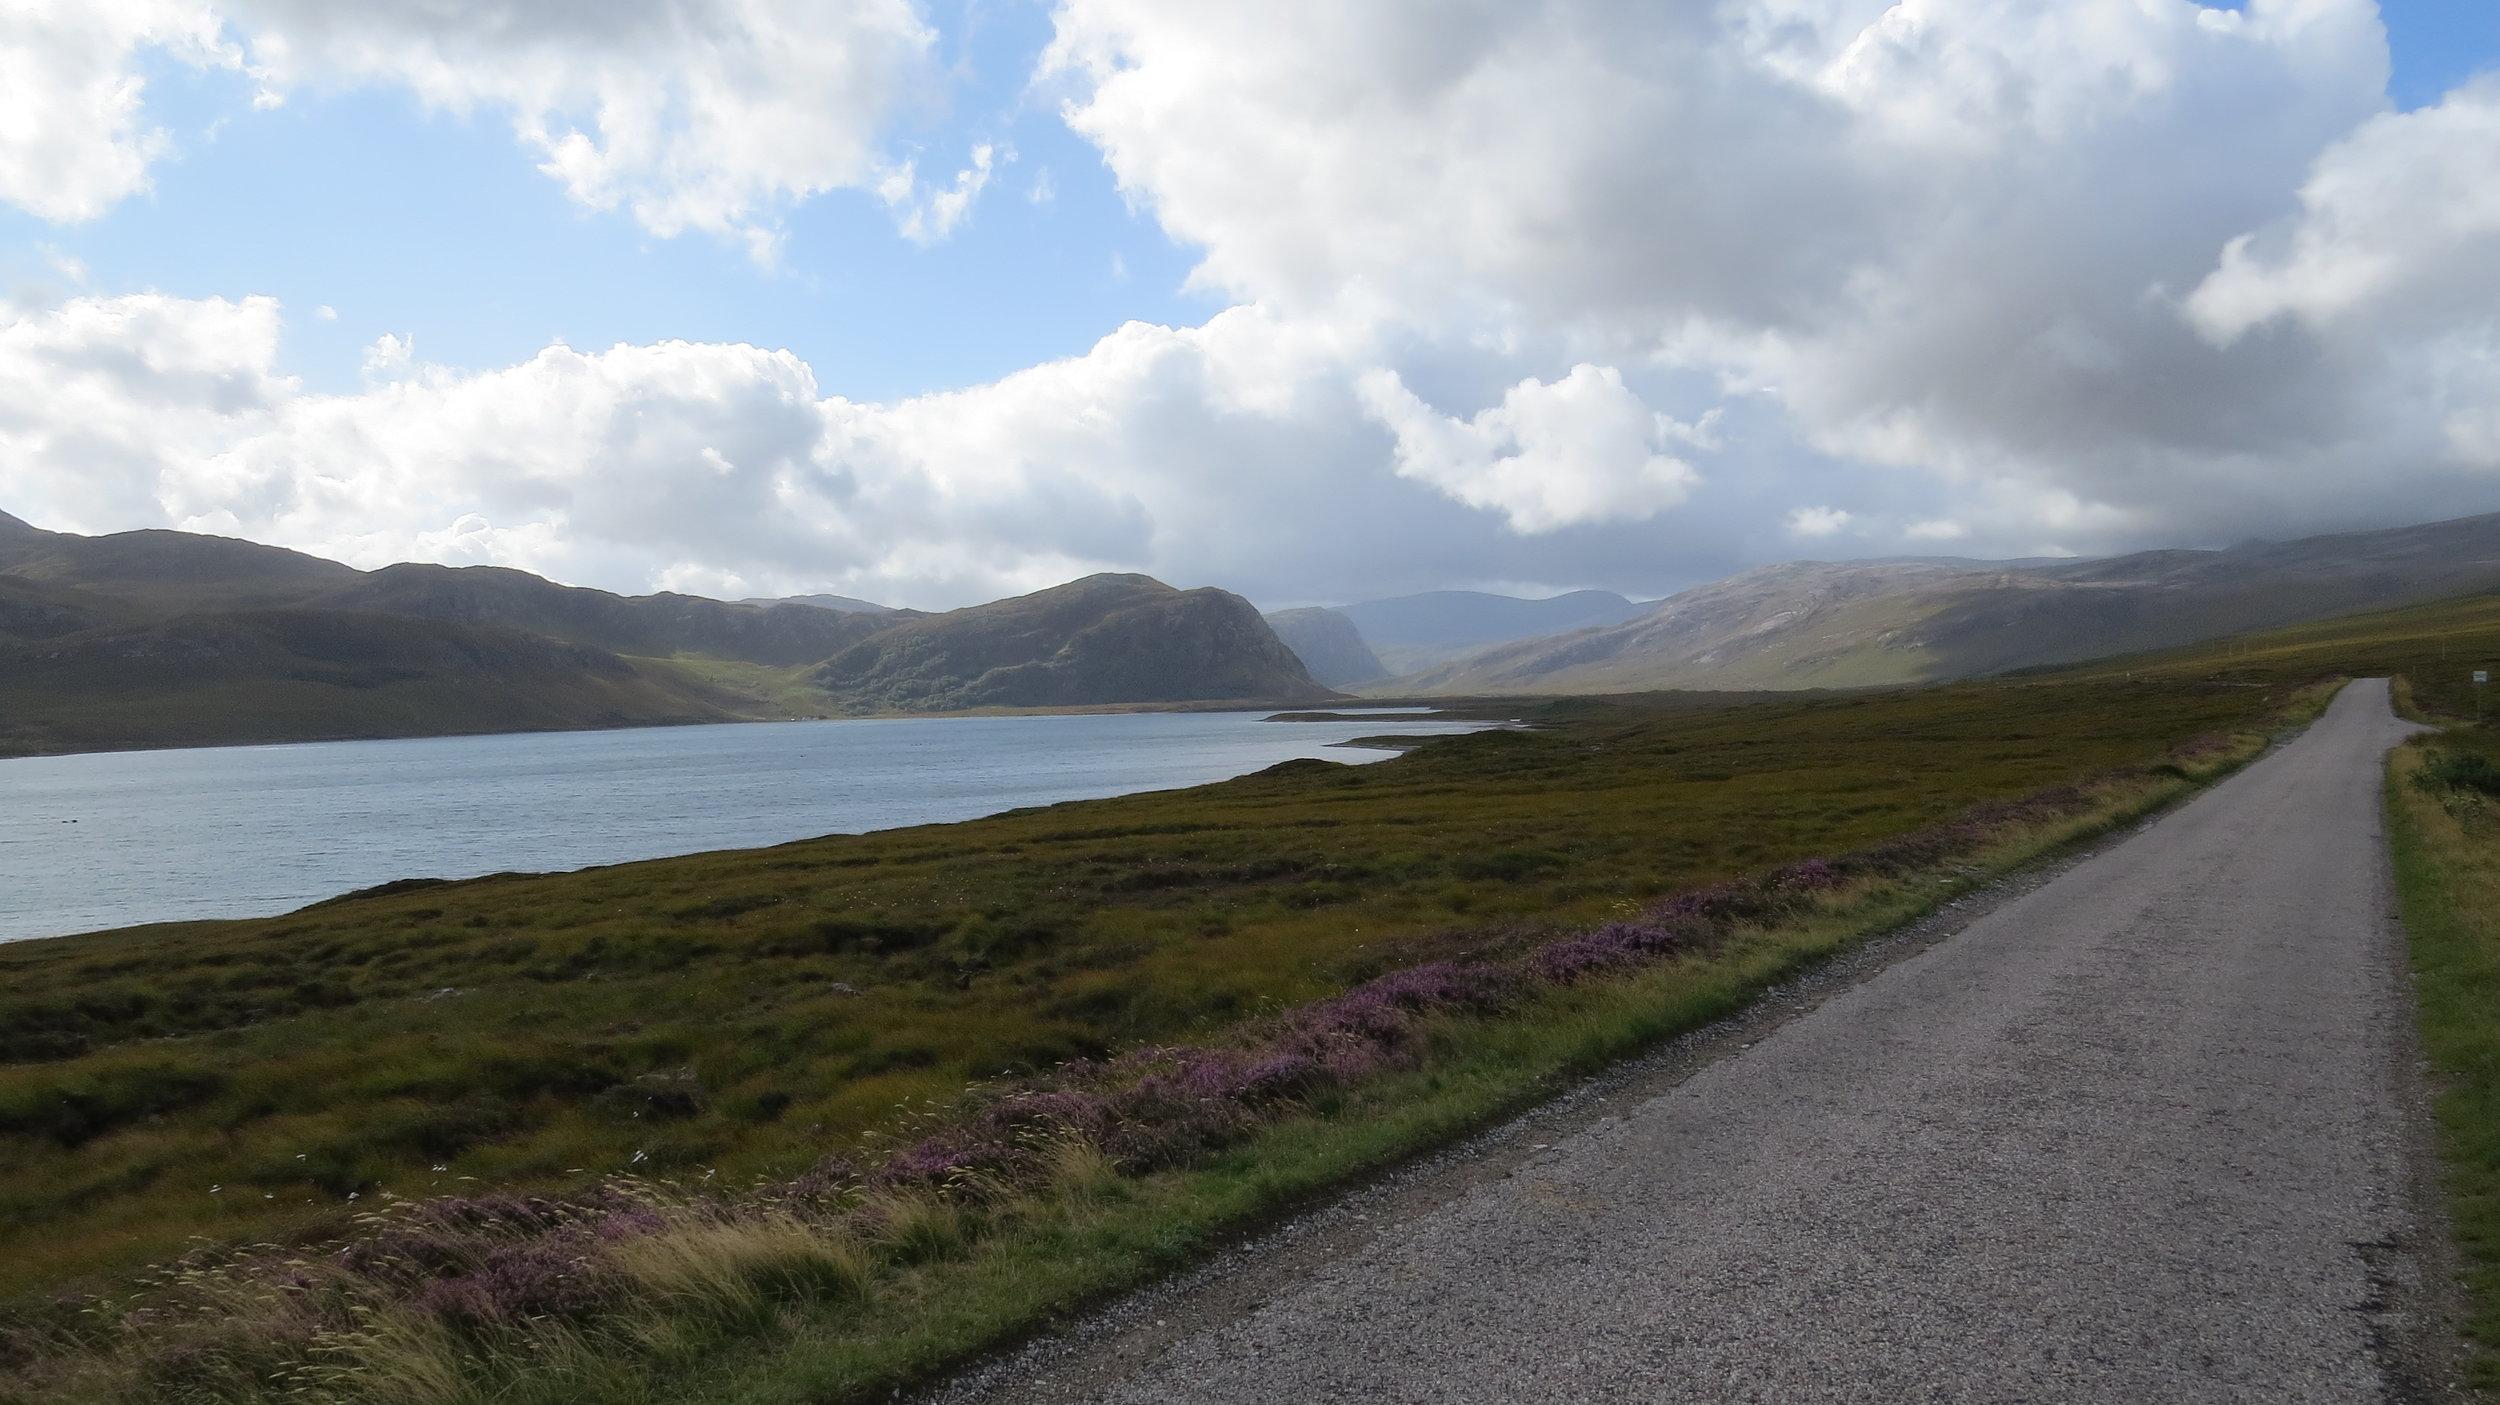 Road down Loch Eriboll